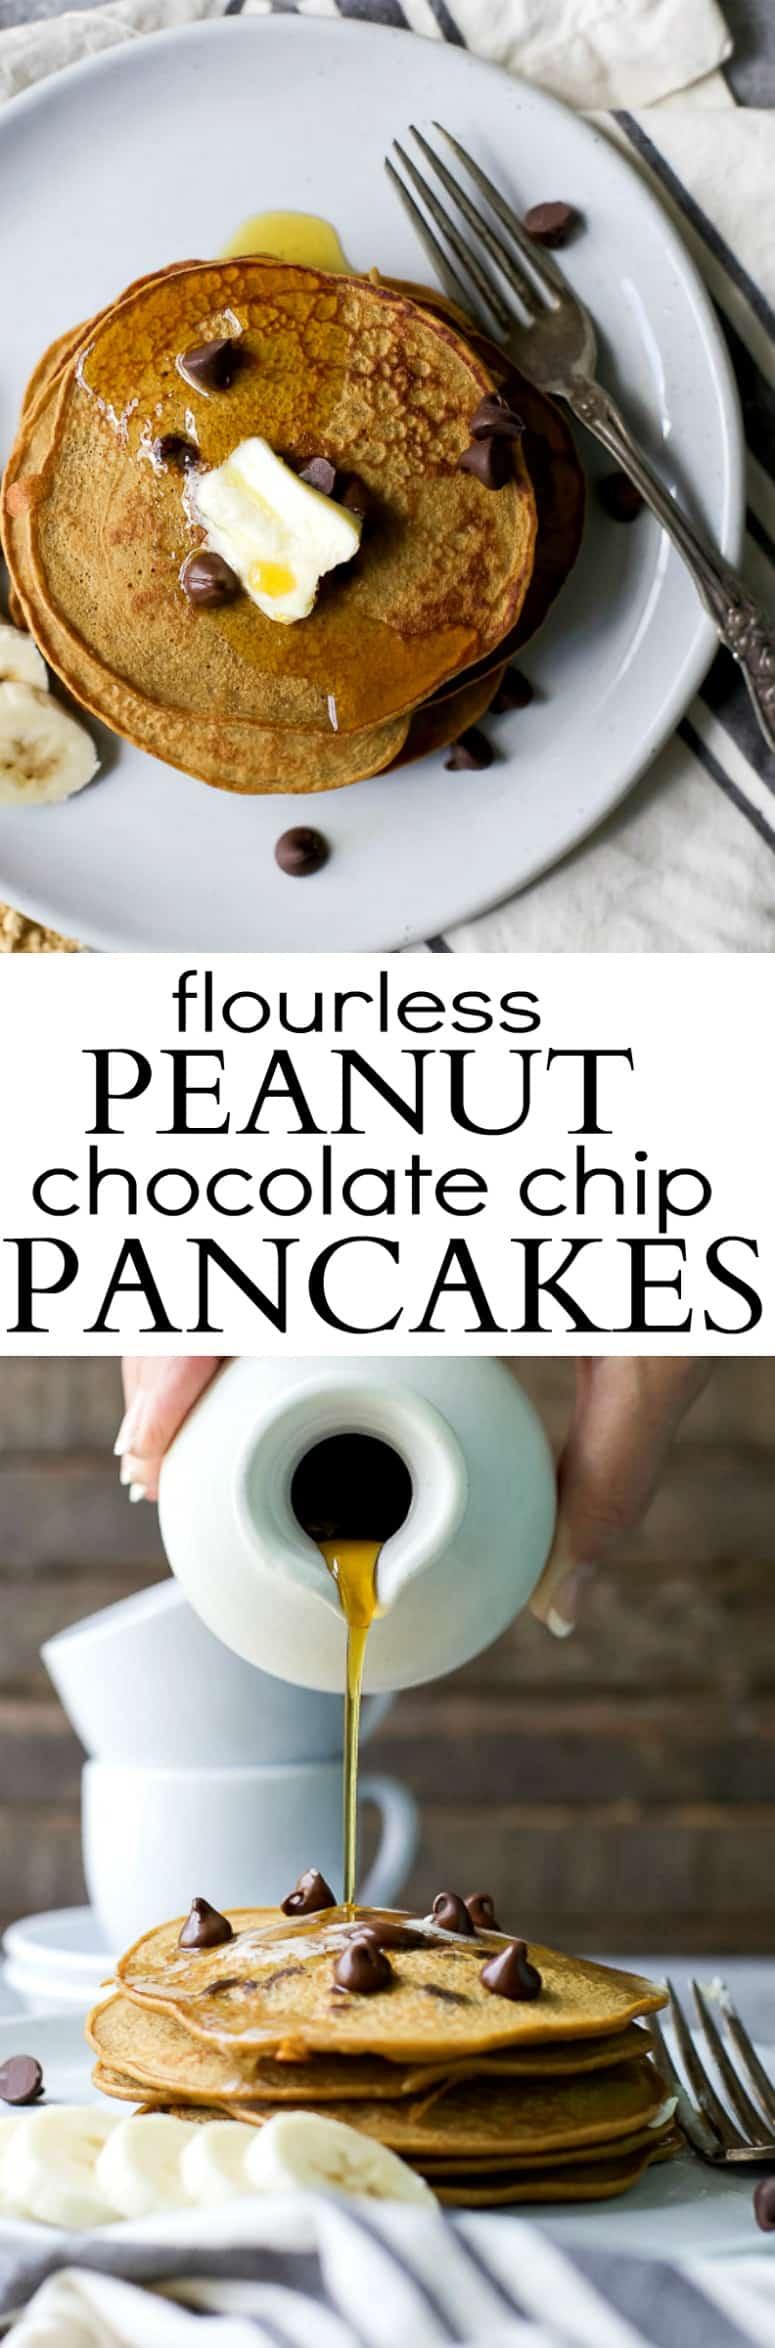 Title Image for Flourless Peanut Chocolate Chip Pancakes